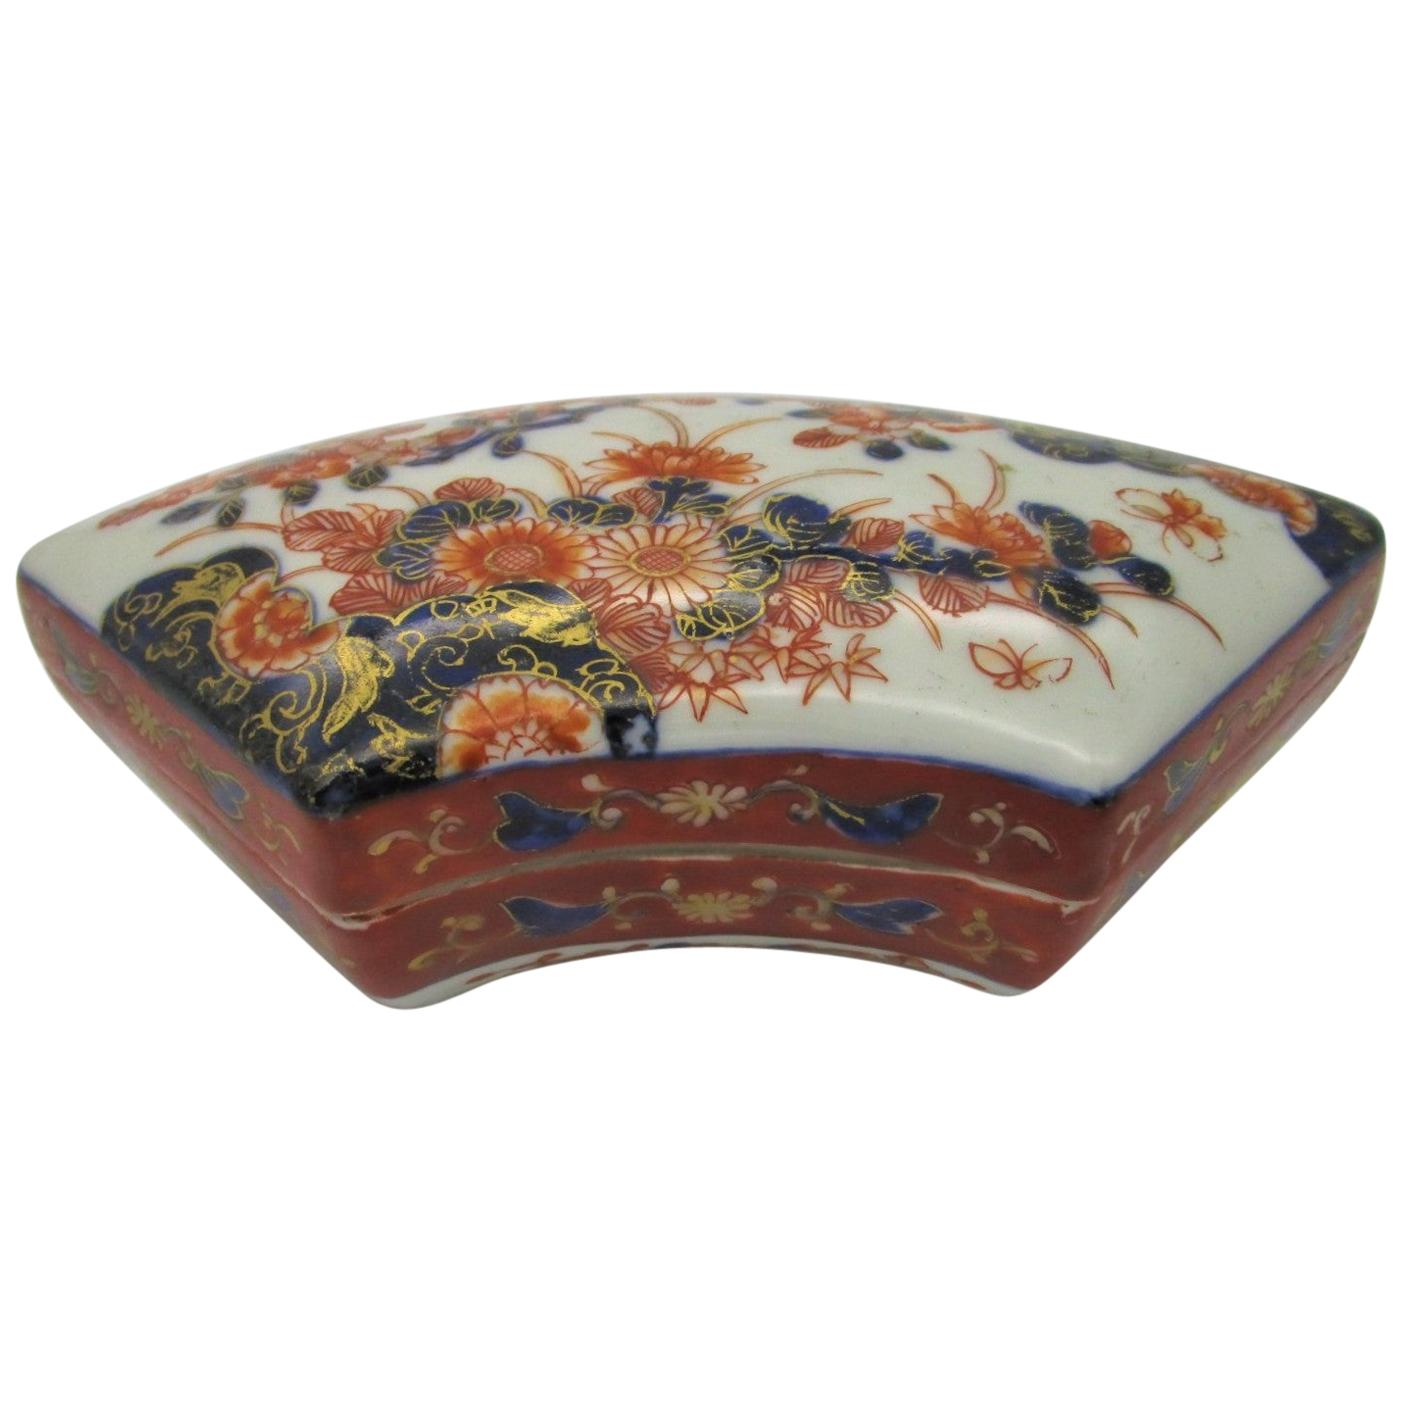 Japanese Meiji Koransha Porcelain Jewelry box or Trinket, circa 1880